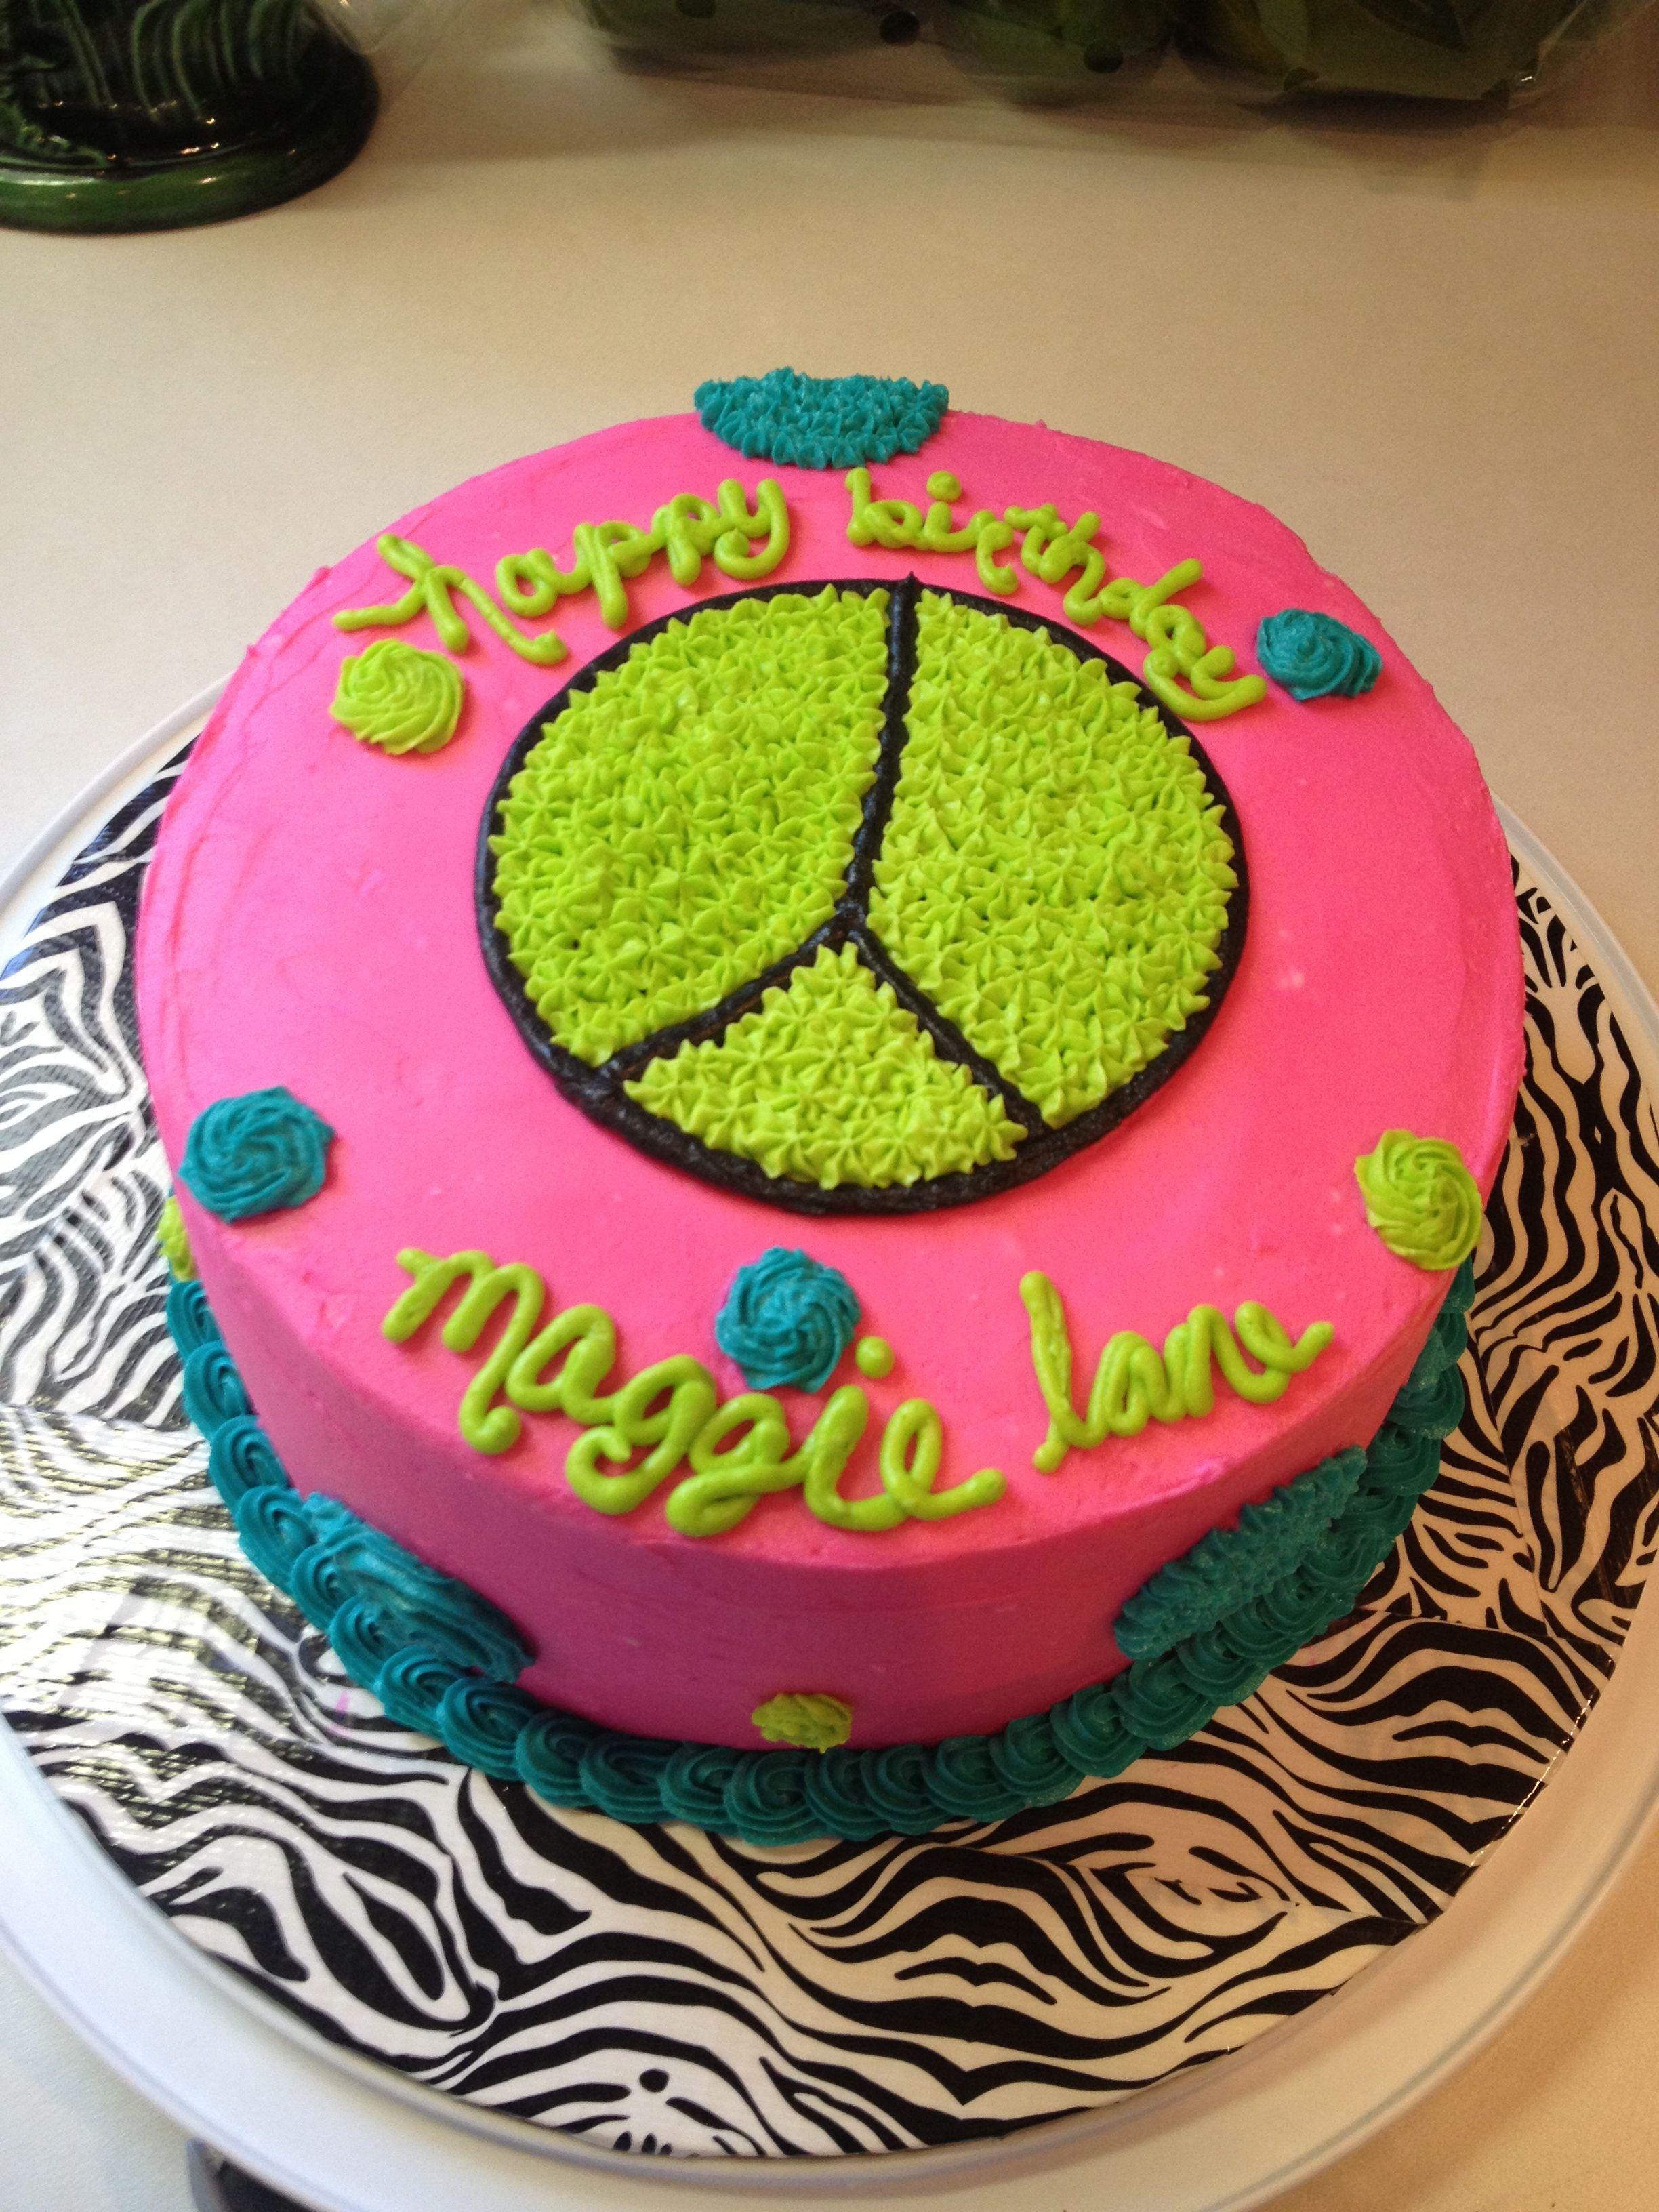 Buttercream Cake For My Girls 11th Birthday Cheeky Cakes